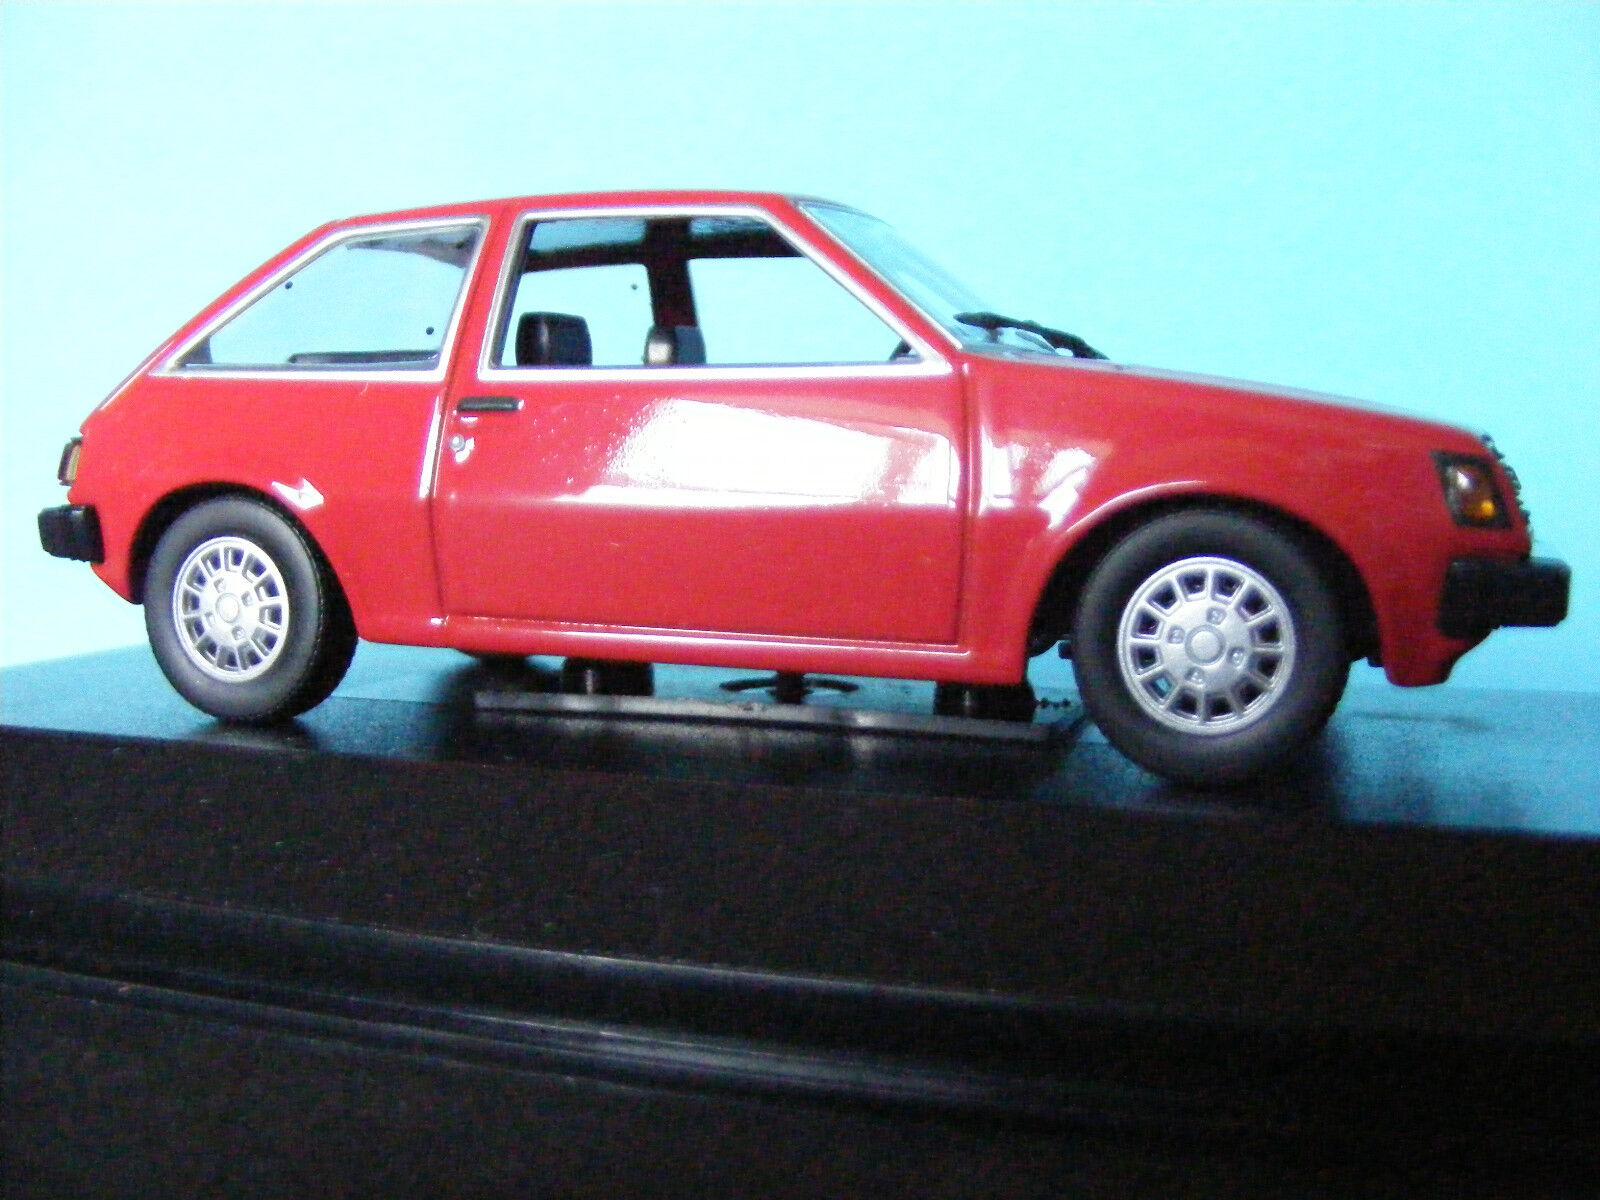 Mitsubishi Colt in Red 1978 LHD New  Minichamp  1 43 NLA